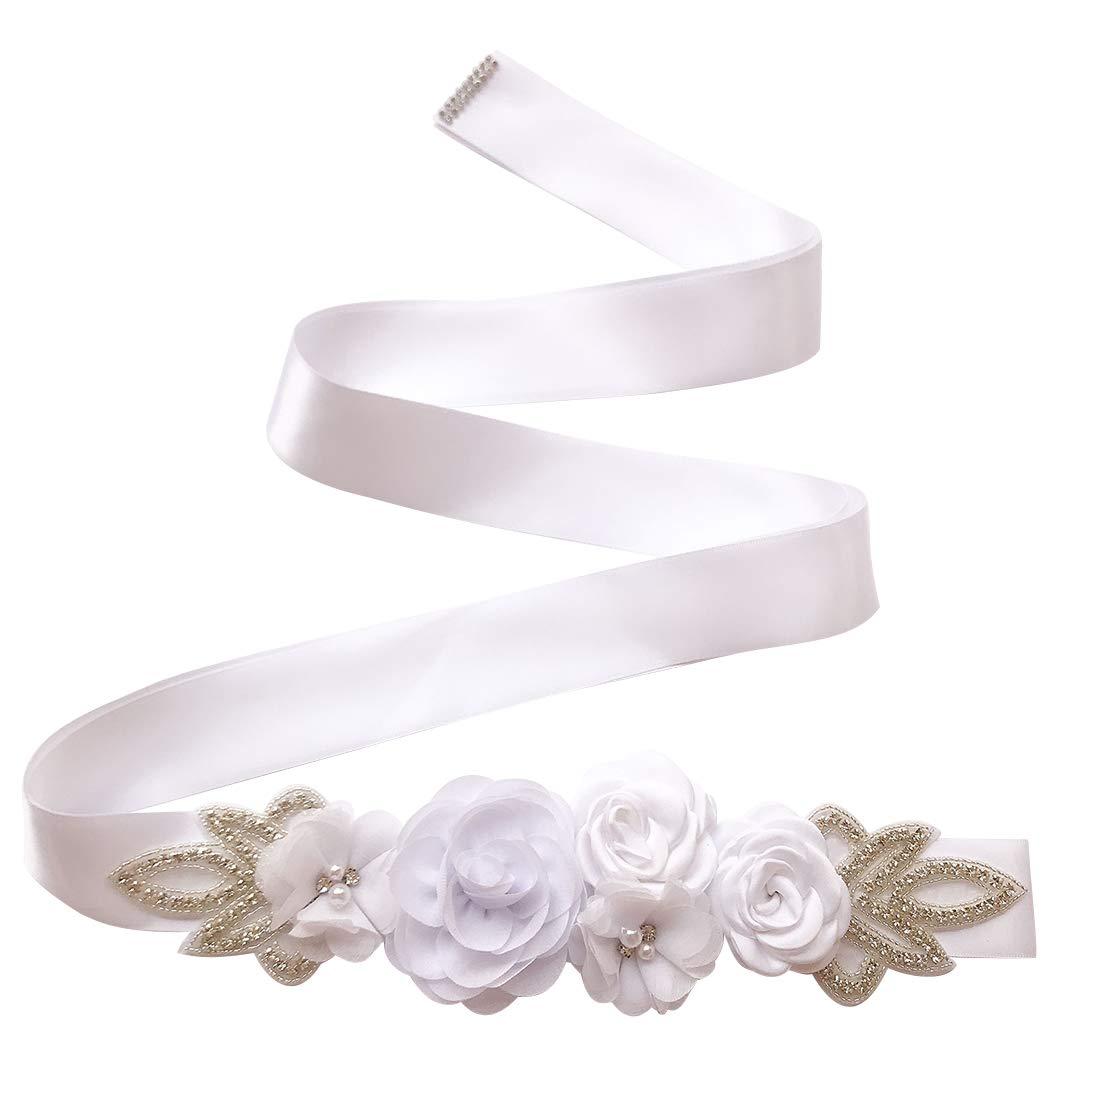 Spmor Womens Bridal Wedding Dress Rhinestone Sash Maternity Sash Belt Flower Baby Girl Sash Belt